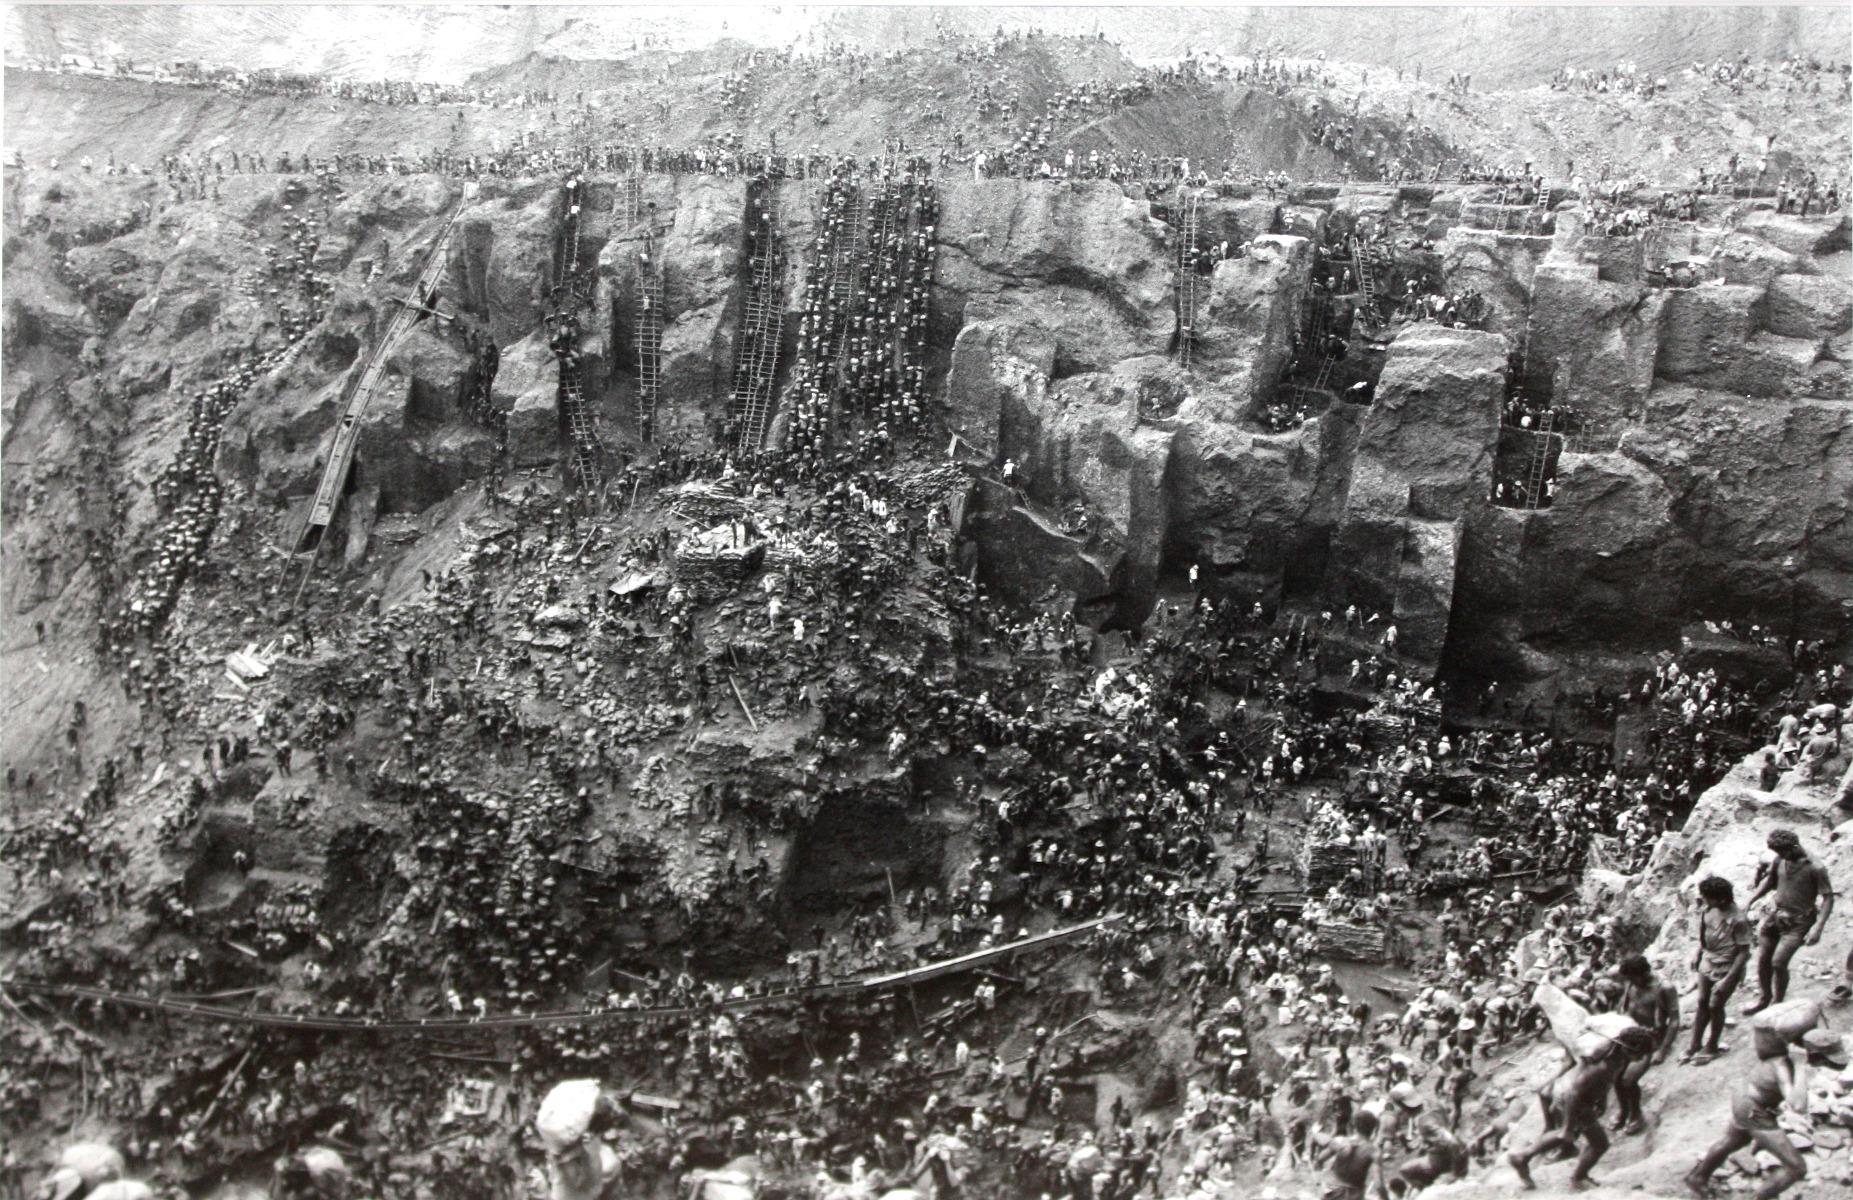 Where-is-gold-found-image-from-1986_Sebastiao_Salgado_Photograph_Serra_Pelada_Gold_Mine_Brazil_Gold_Mining_Brasil-SD-Bullion-SDBullion.com